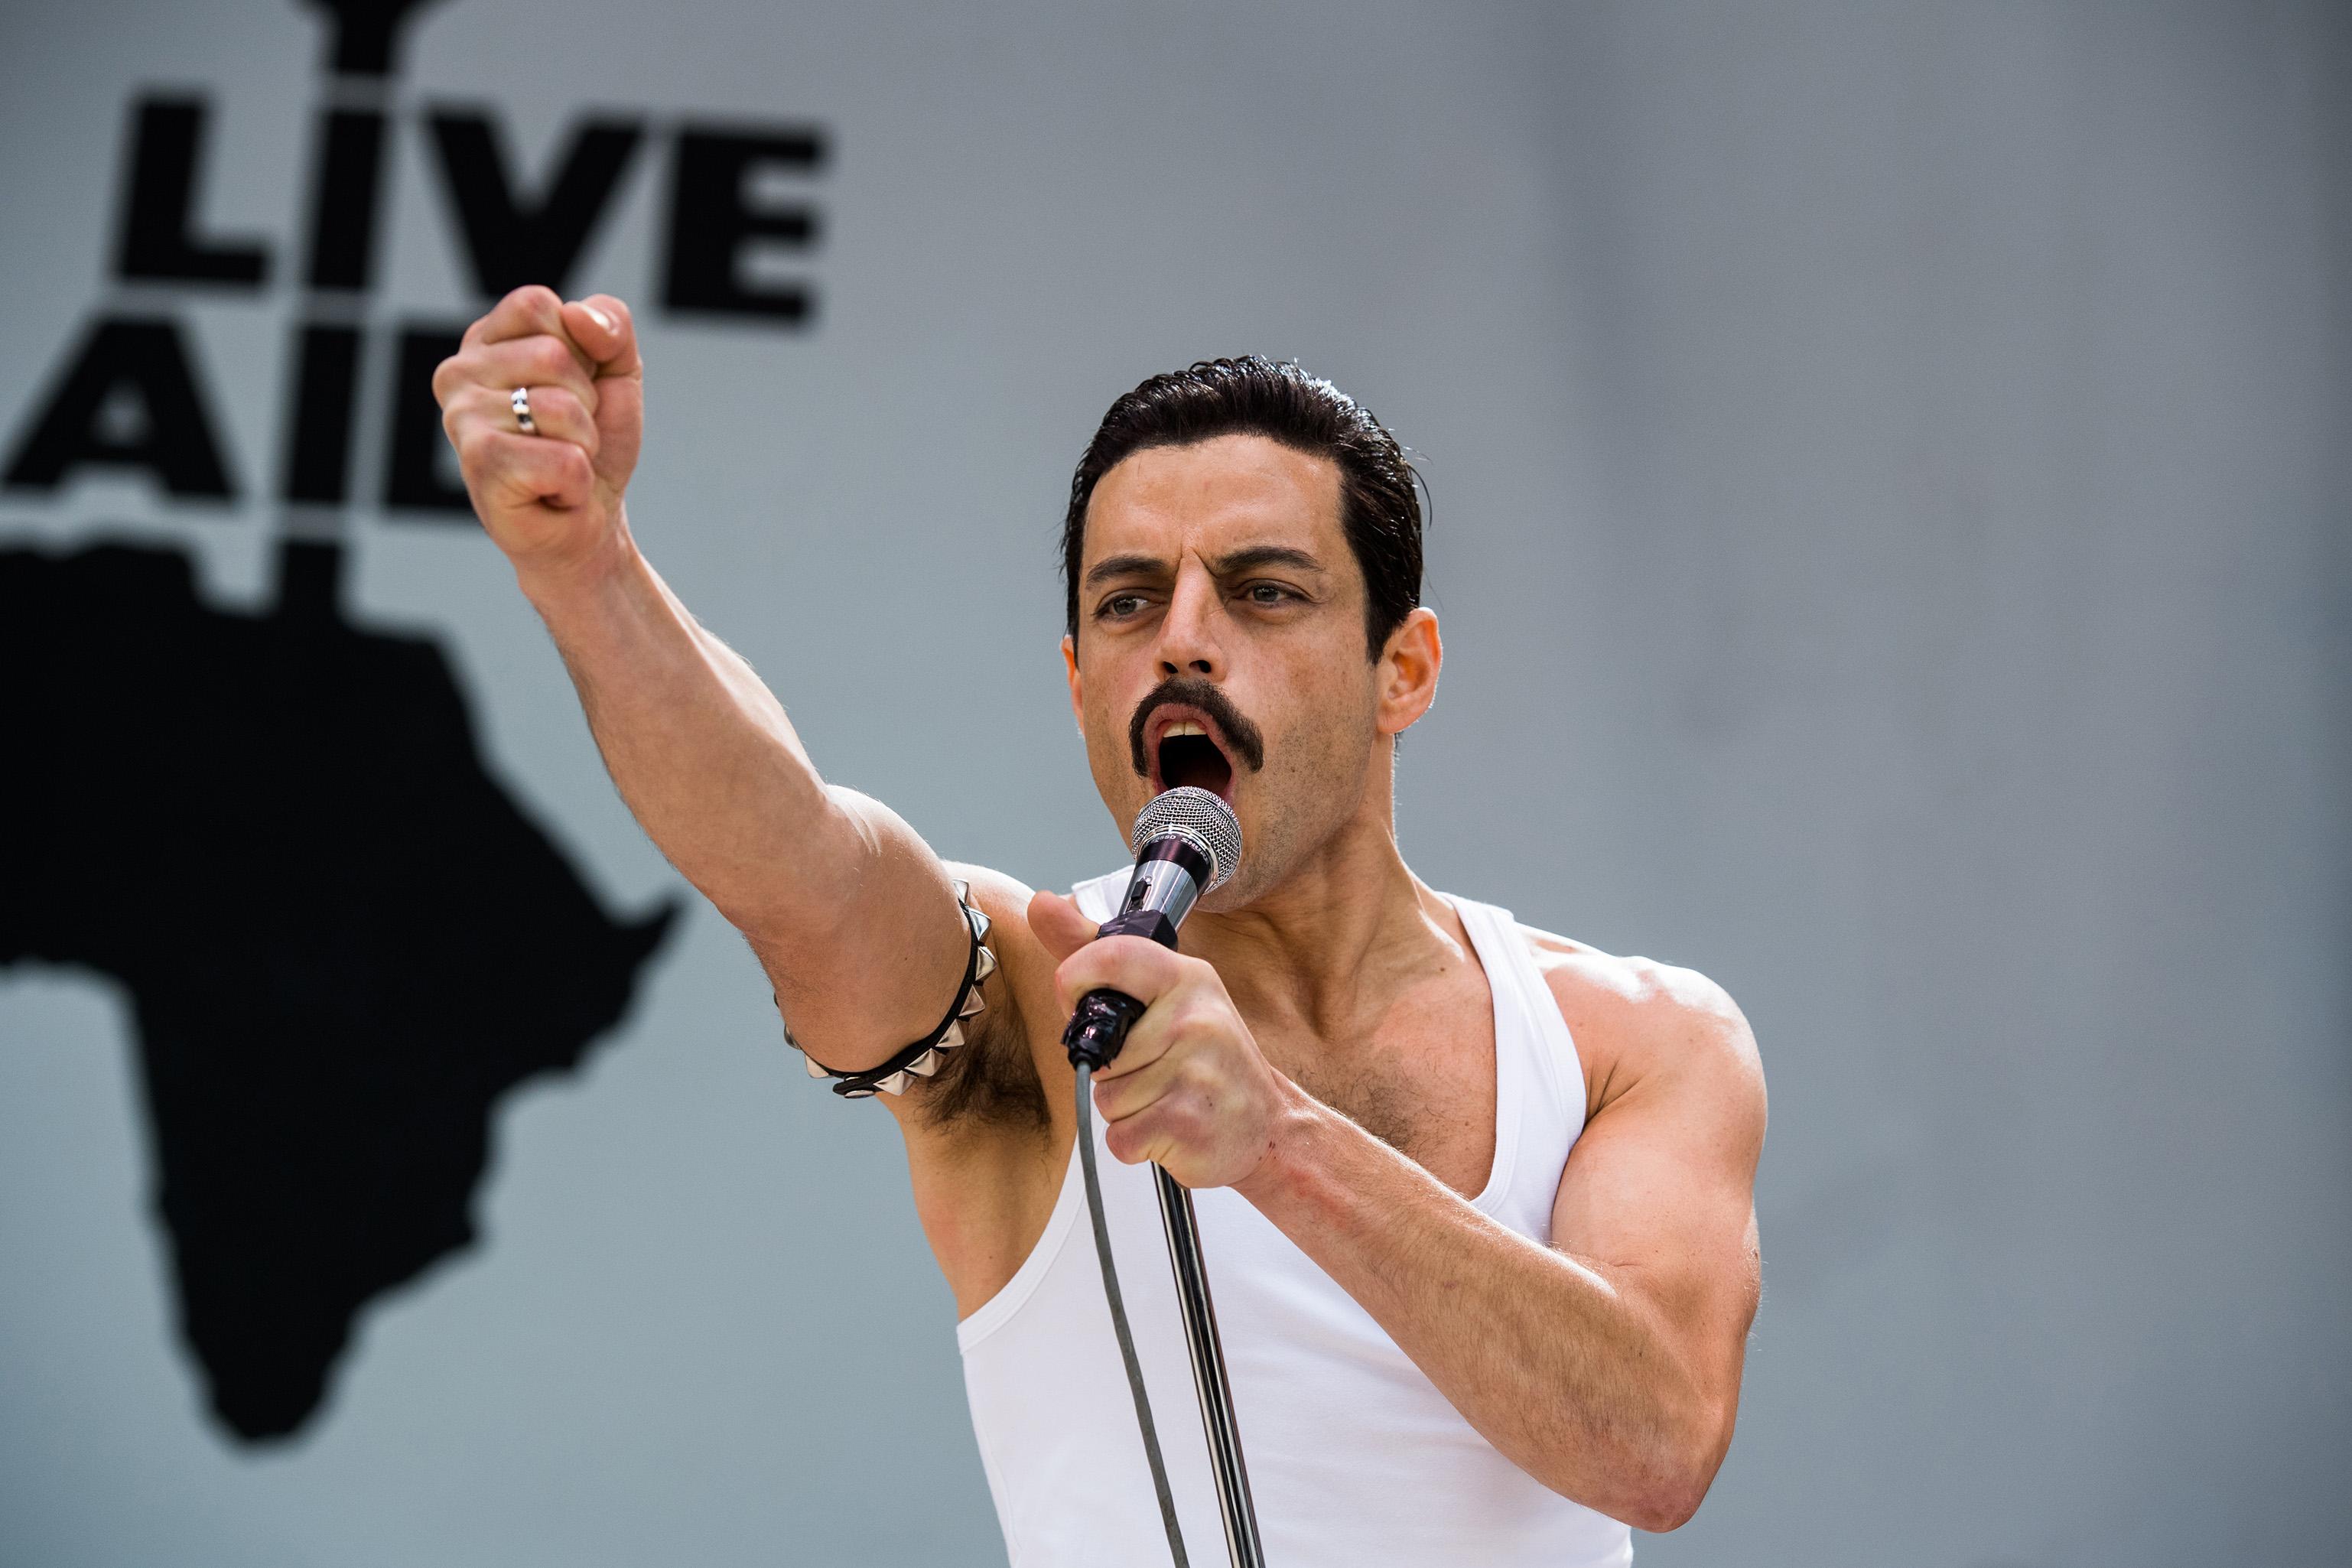 Rami Malek stars as Freddie Mercury in Twentieth Century Fox's BOHEMIAN RHAPSODY. Photo credit: Alex Bailey. TM & © 2018 Twentieth Century Fox Film Corporation. All Rights Reserved. Not for sale or duplication.